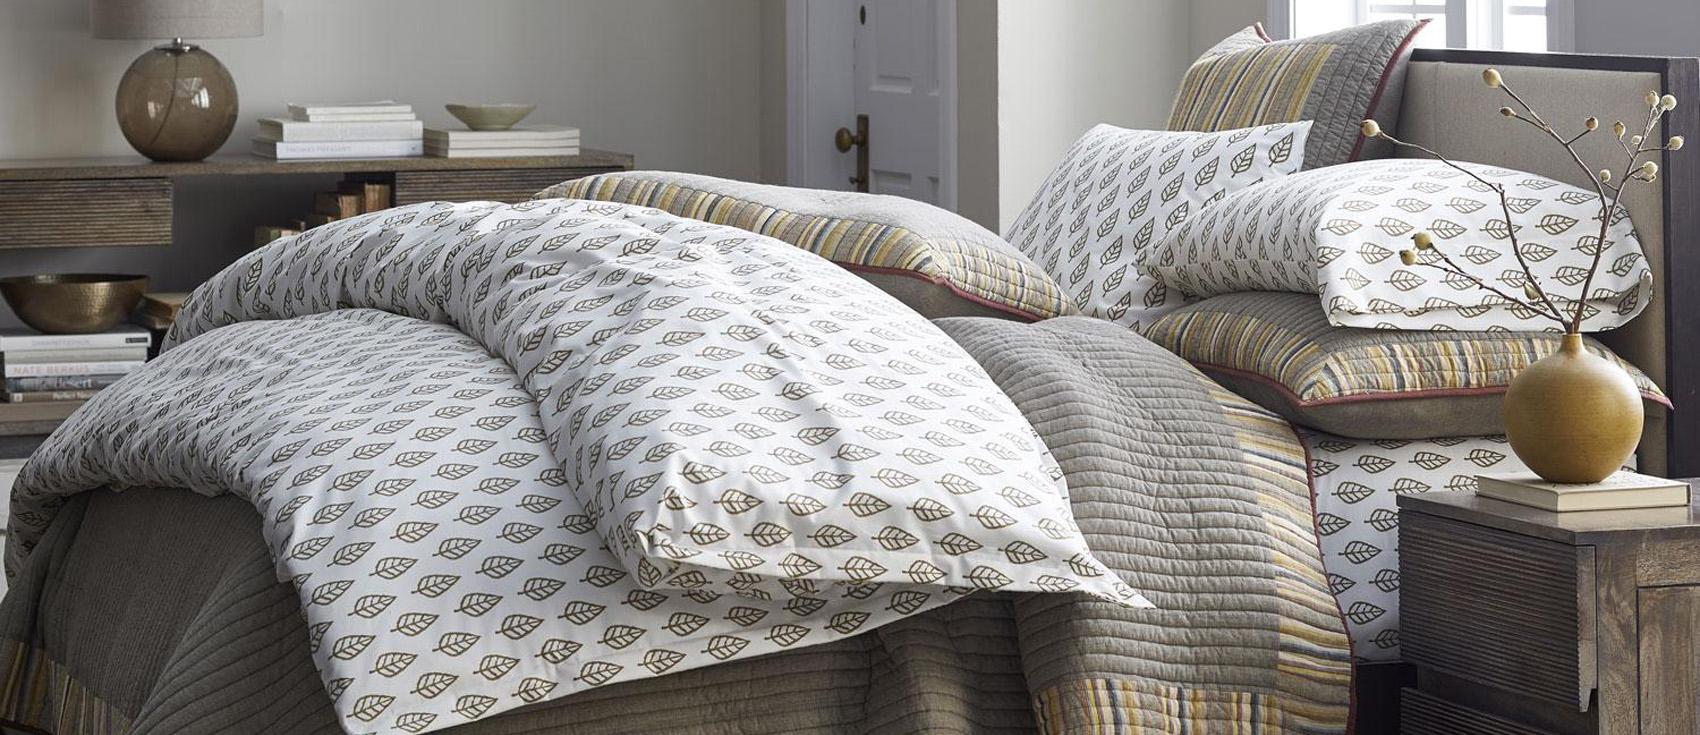 Quilt Bedding Duvet Covers Amp Comforters Buyer Select